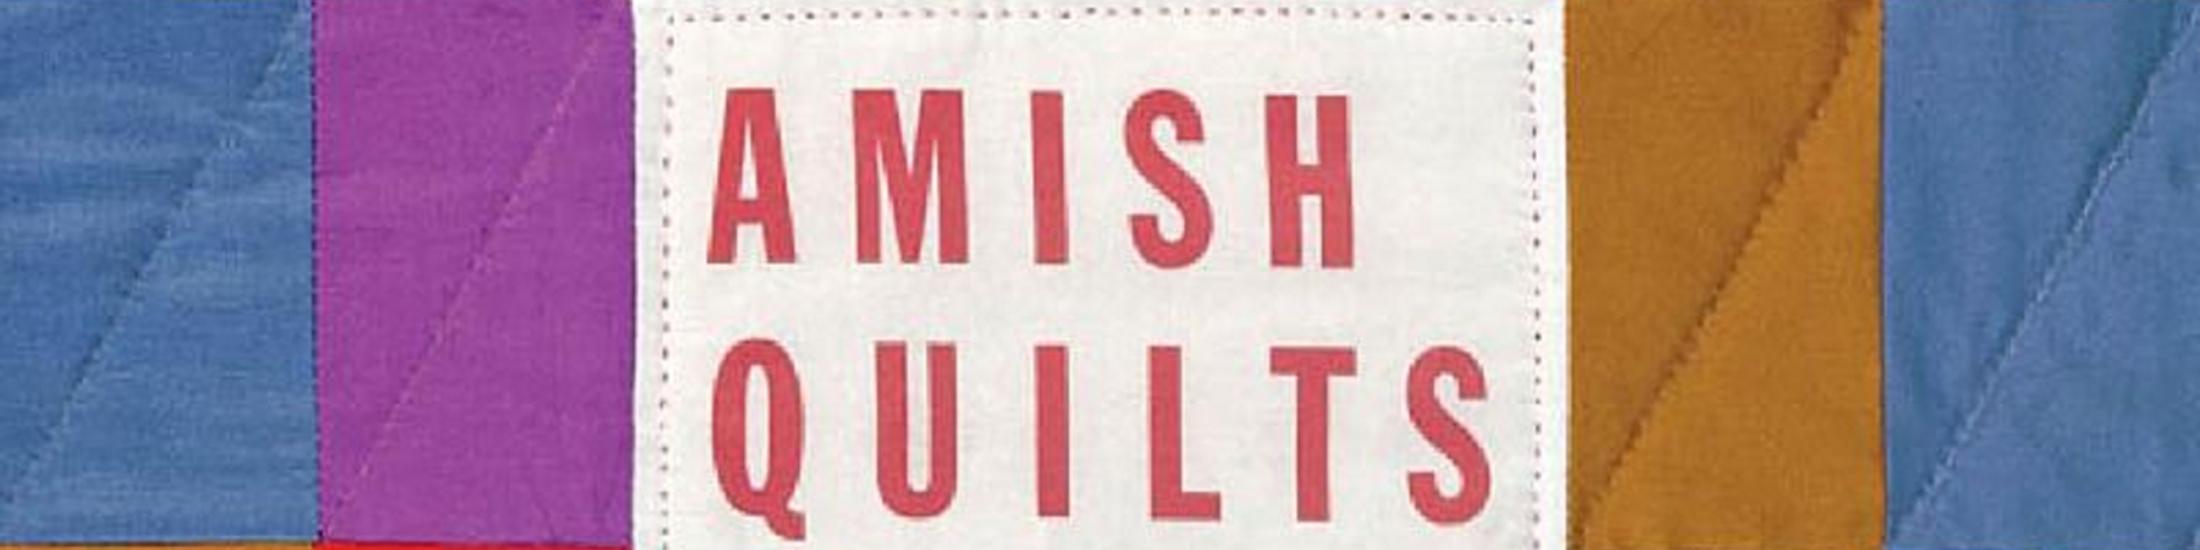 """Amish Quilts"" by Janneken Smucker"